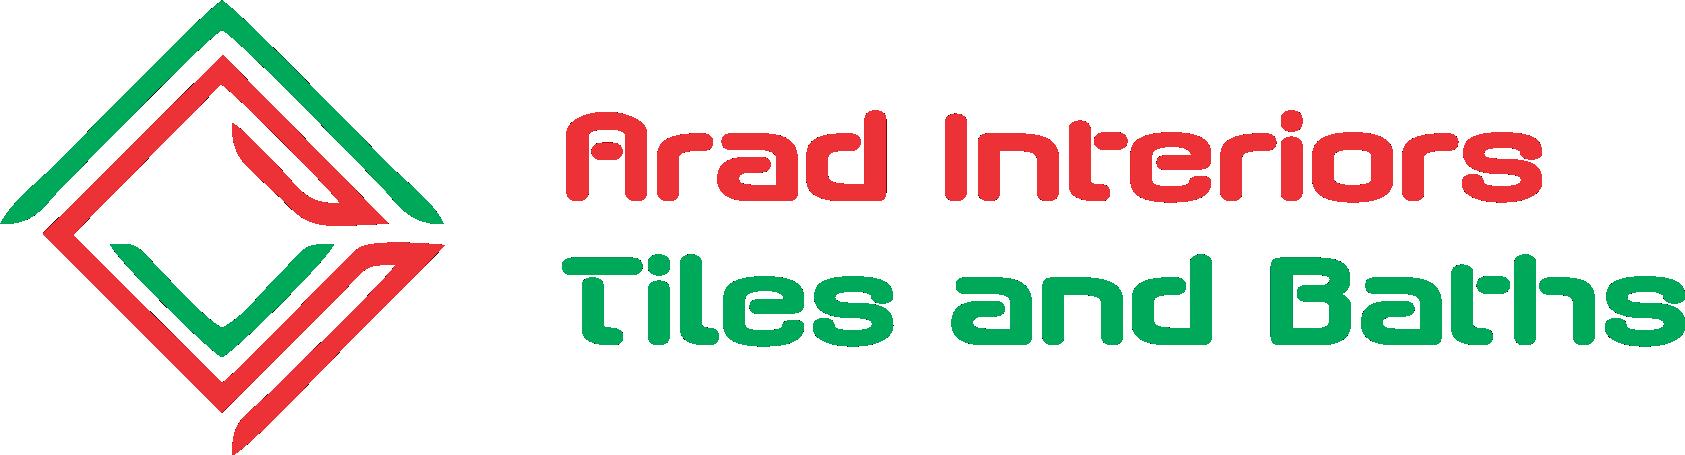 Arad Interiors Tiles and Baths